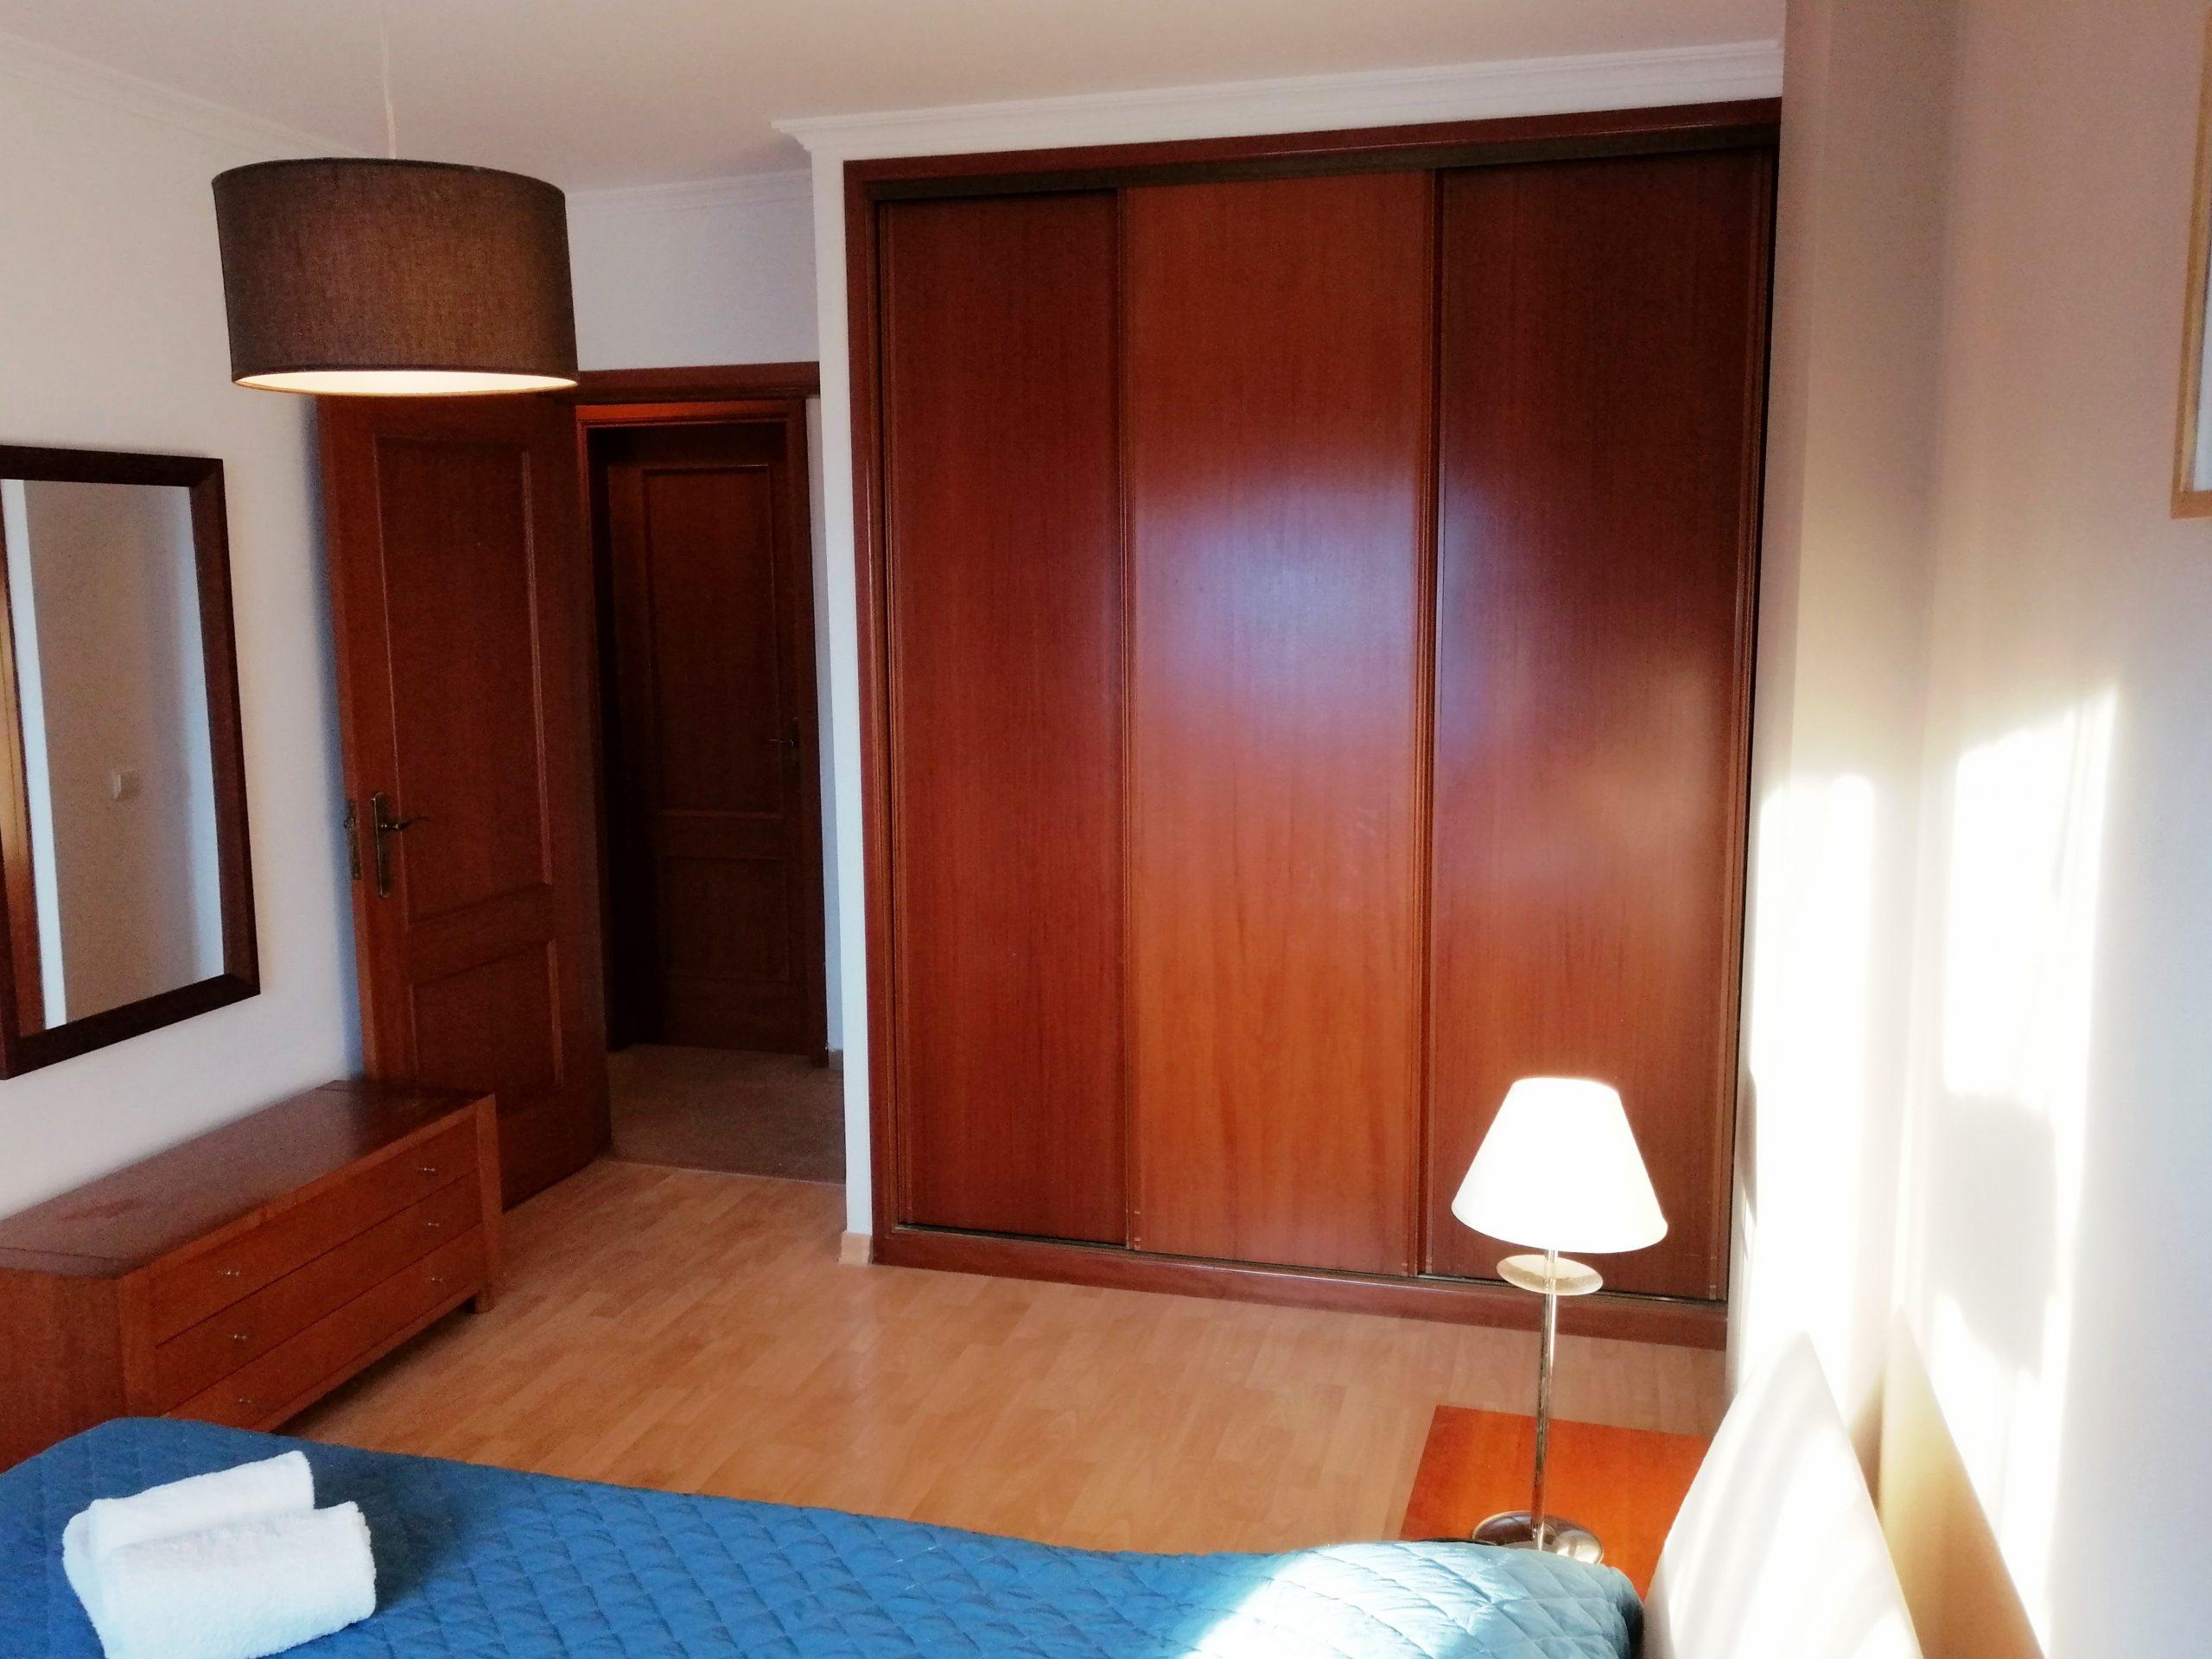 Holiday apartments and villas for rent, T1 Albufeira em cond. fechado c/ piscina 4/5 pessoas JUN / JUL / AGO / SET in Albufeira, Portugal Algarve, REF_IMG_14867_14882